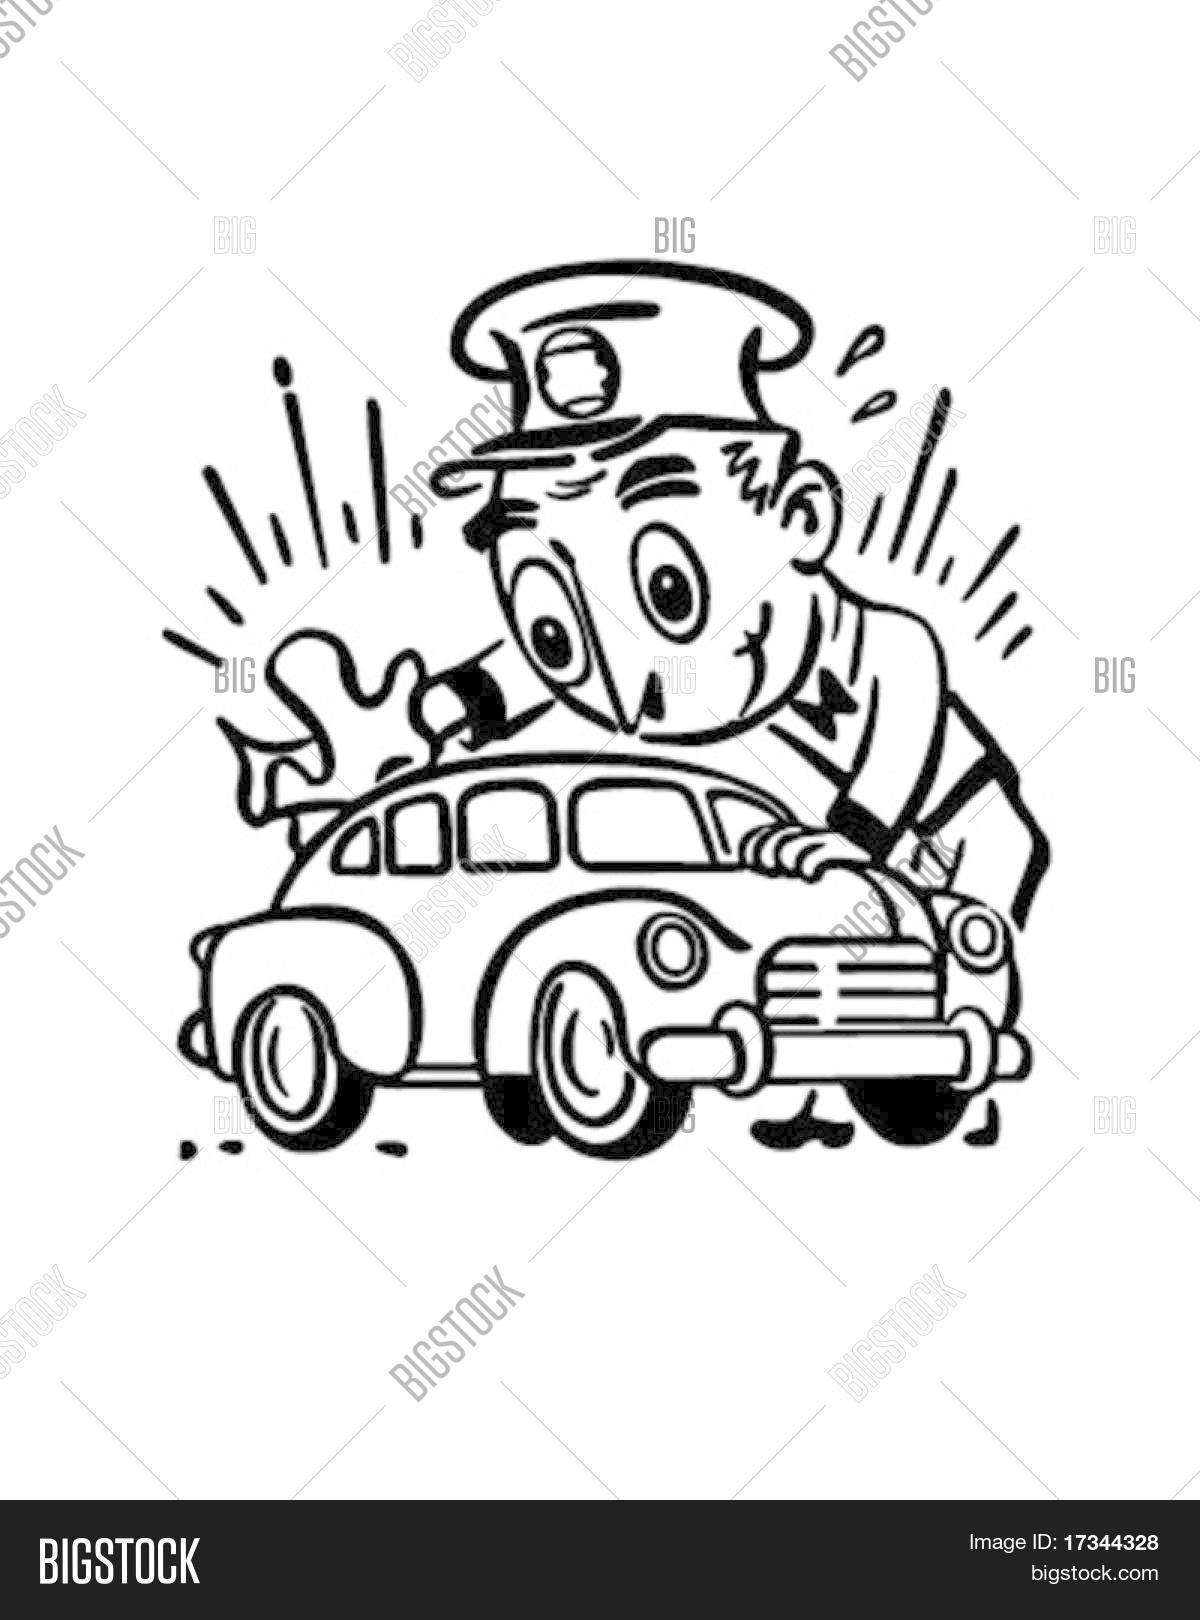 Stock Vector Car Wash Retro Clip Art in addition Man Washing Car Retro Clip Art 299649 additionally 911 in addition Man Washing Car Retro Clip Art 299649 as well  on 50s car wash